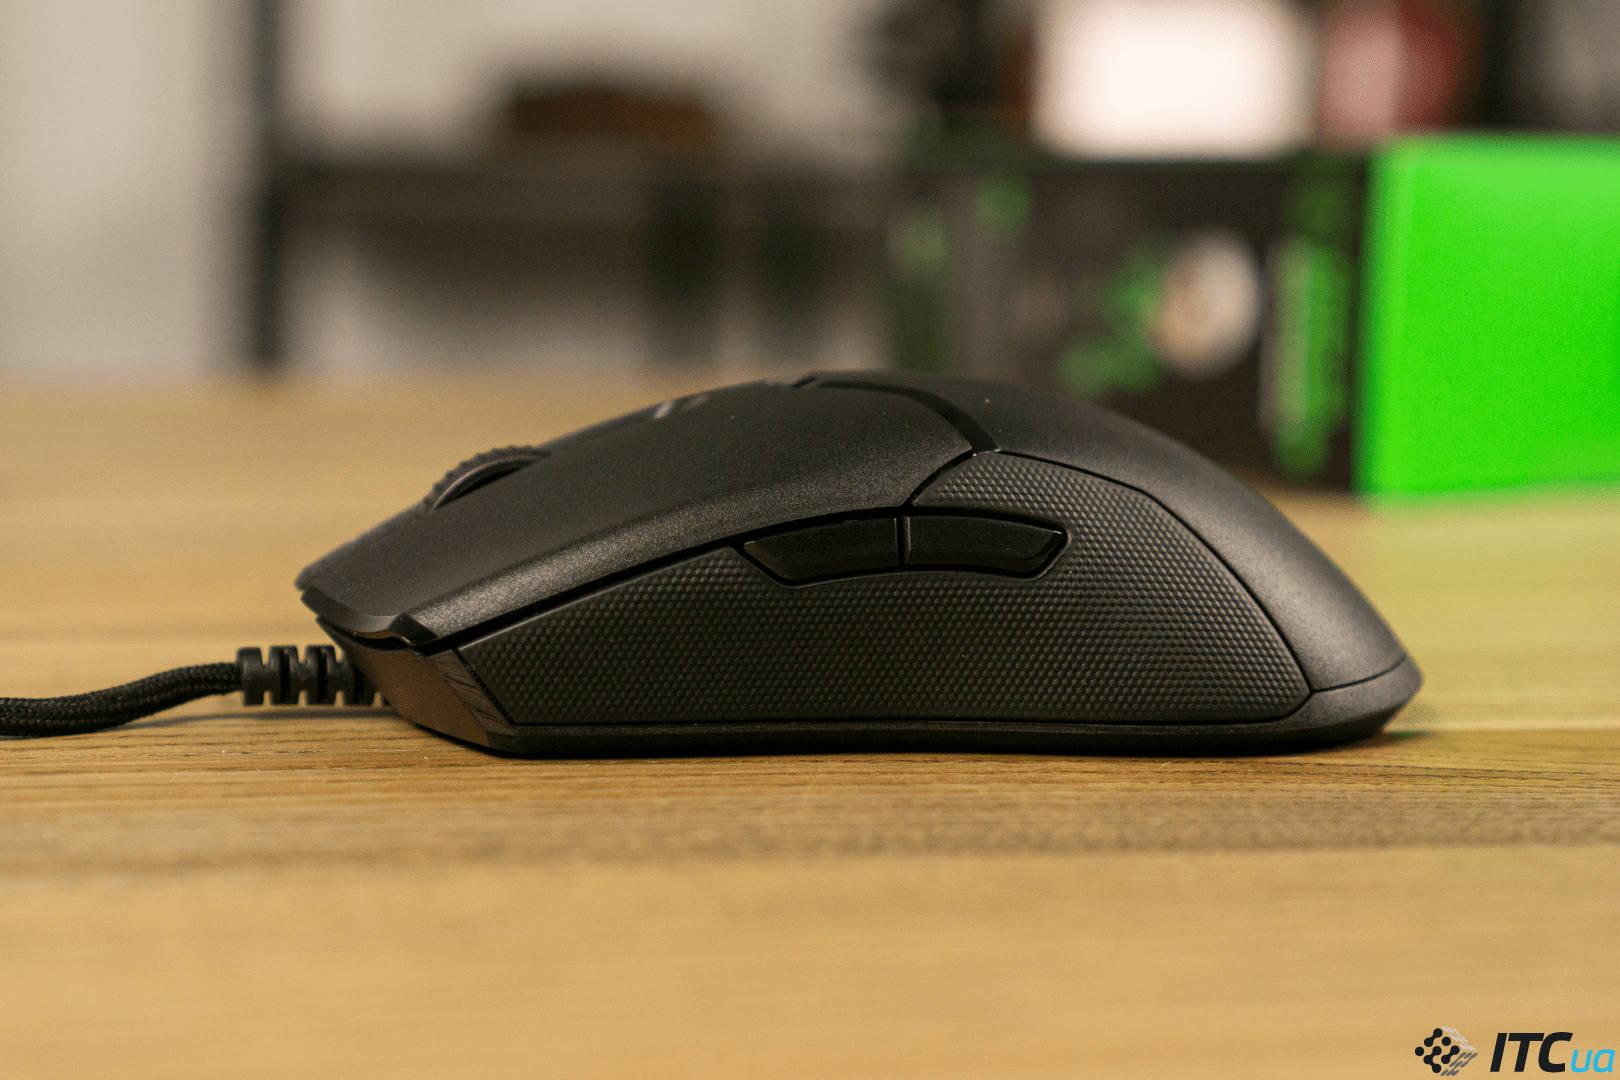 Мышка Razer Viper. Фото 5